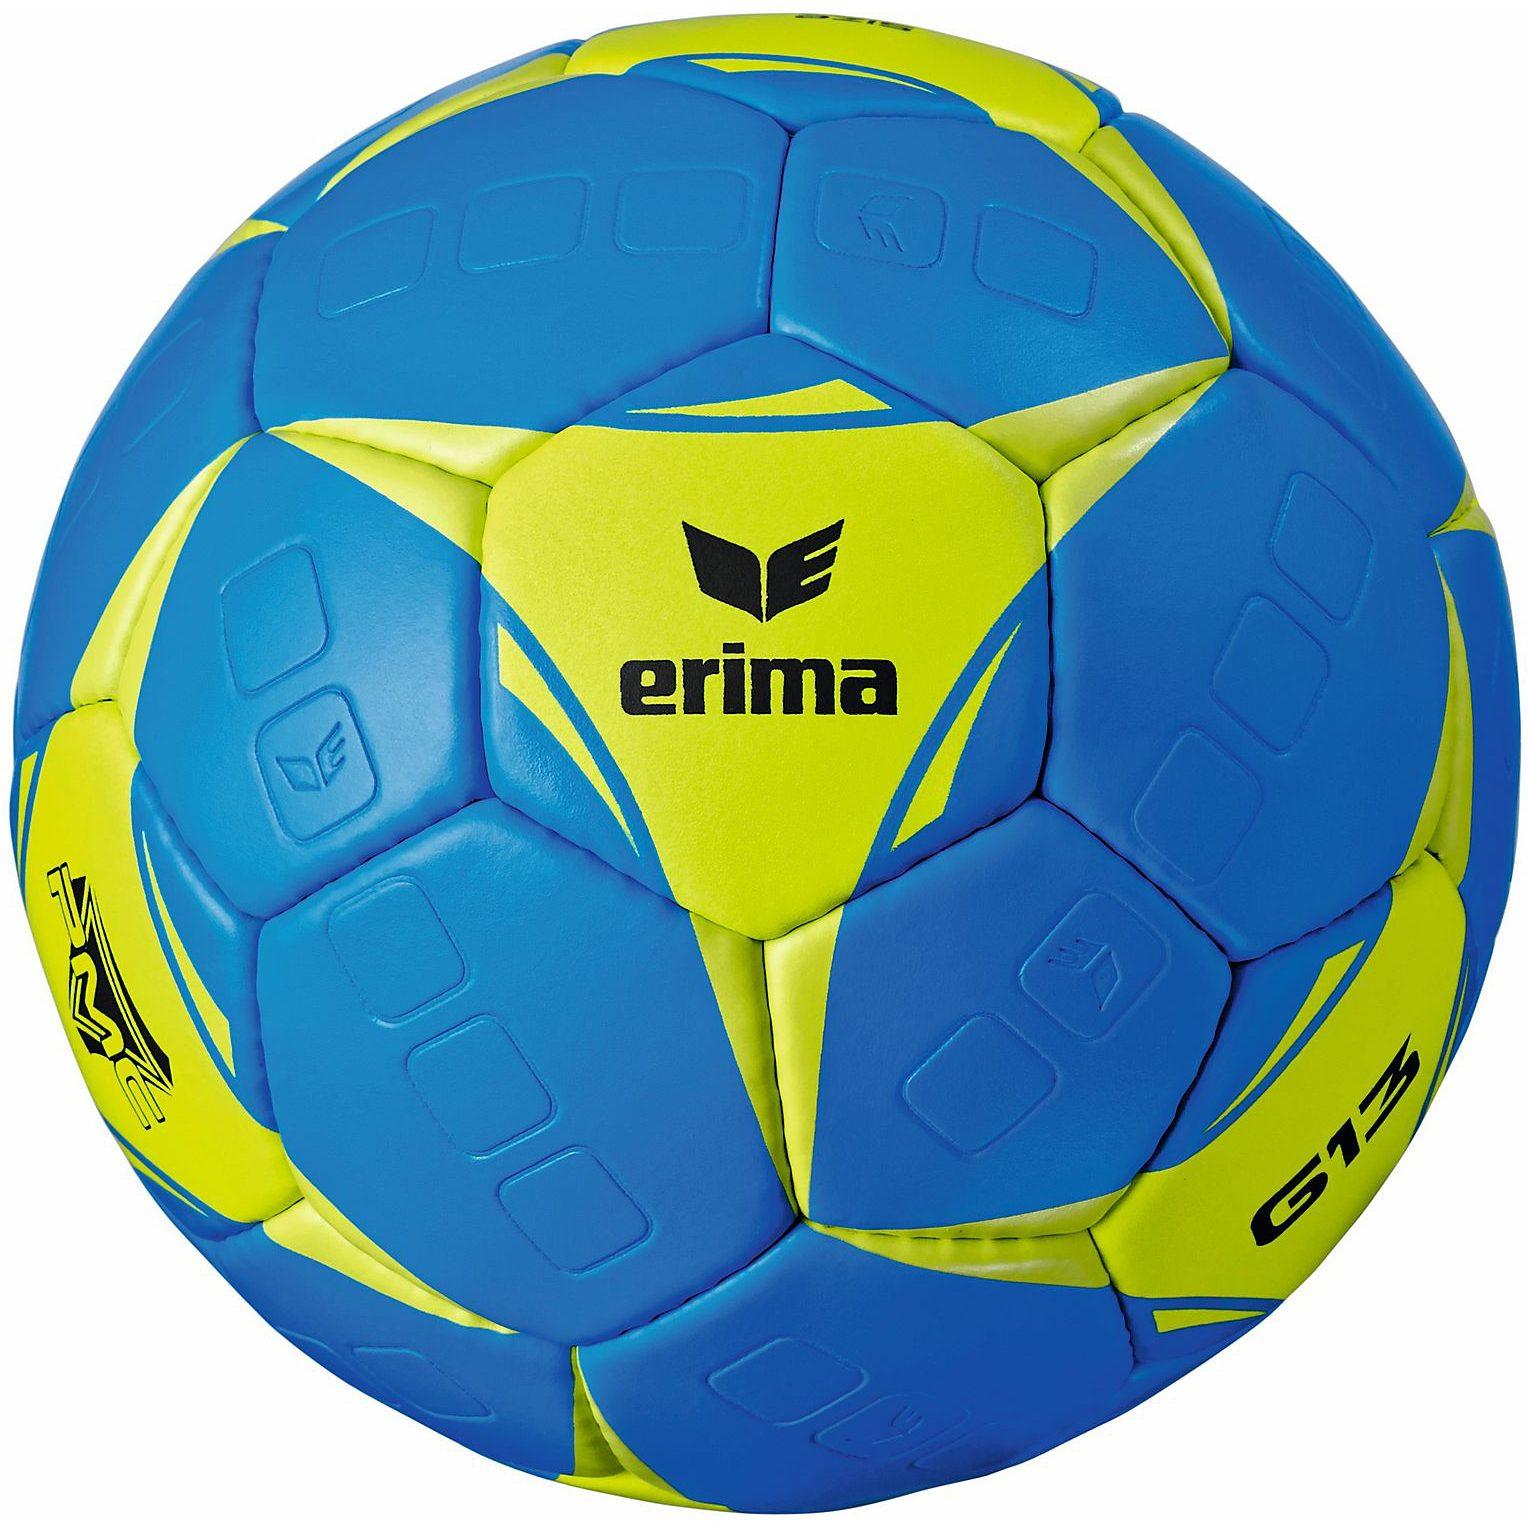 ERIMA G13 Handball